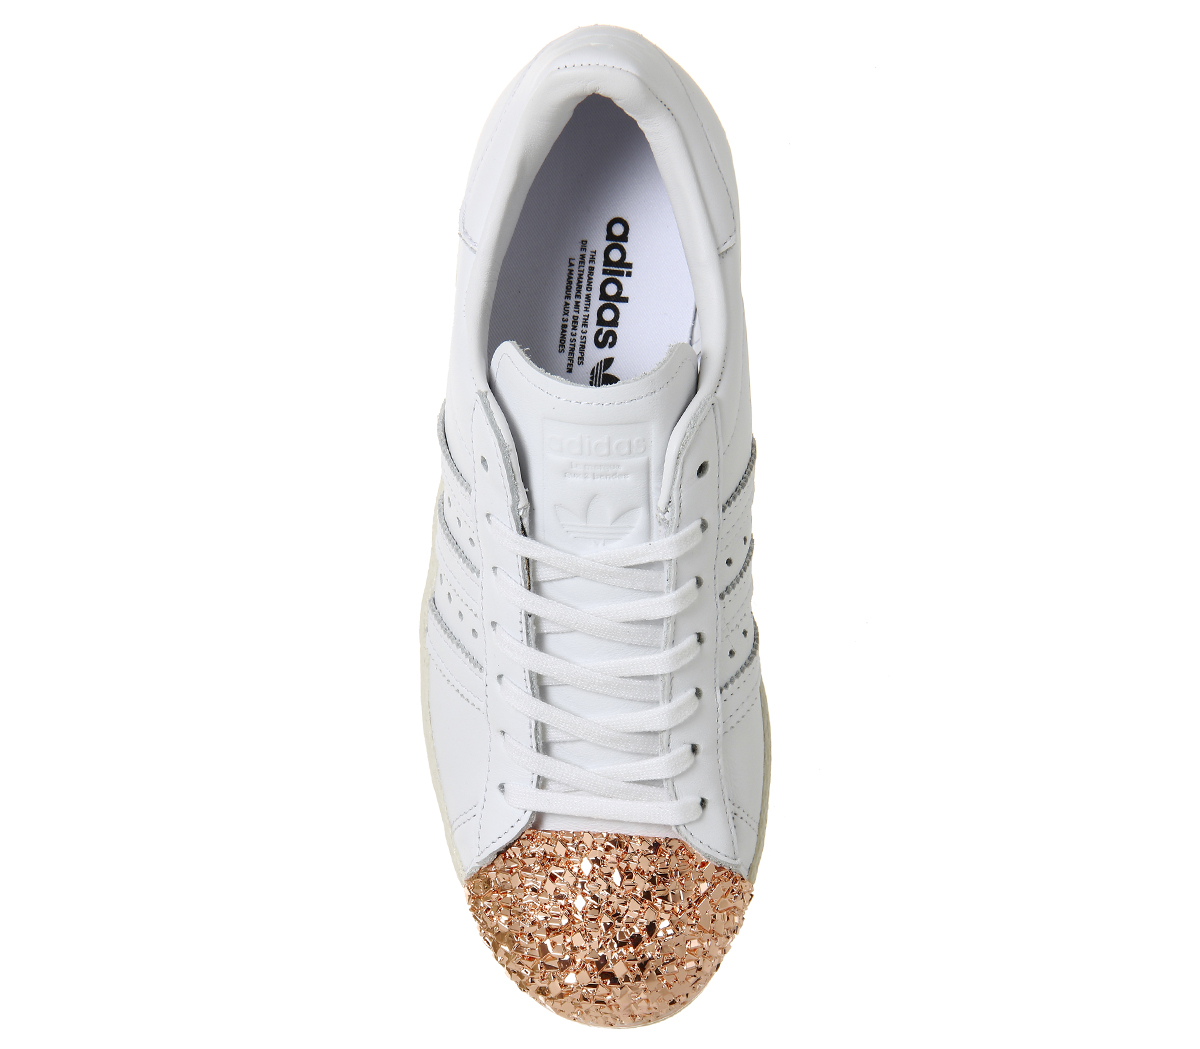 brand new a5601 d4fc5 adidas superstar 80s gold metal toe